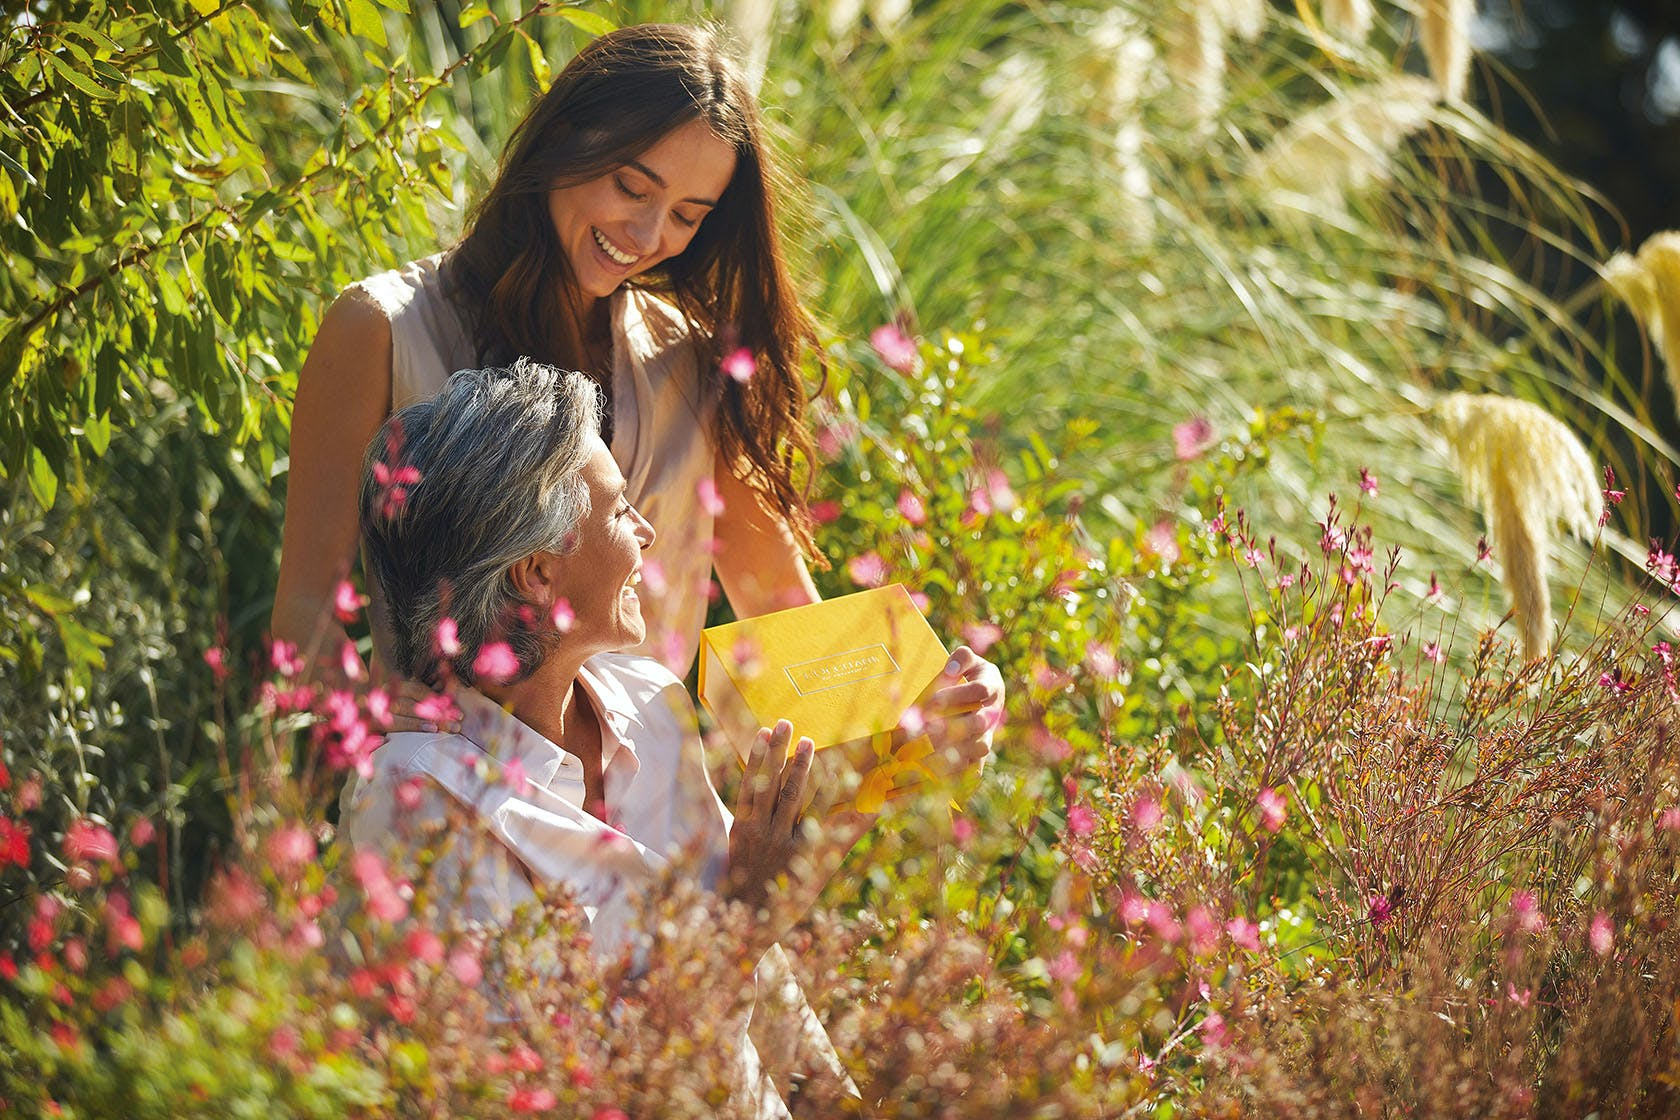 L'OCCITANE歐舒丹 格斯拉玫瑰香氛組/草本健康平衡組|美周報